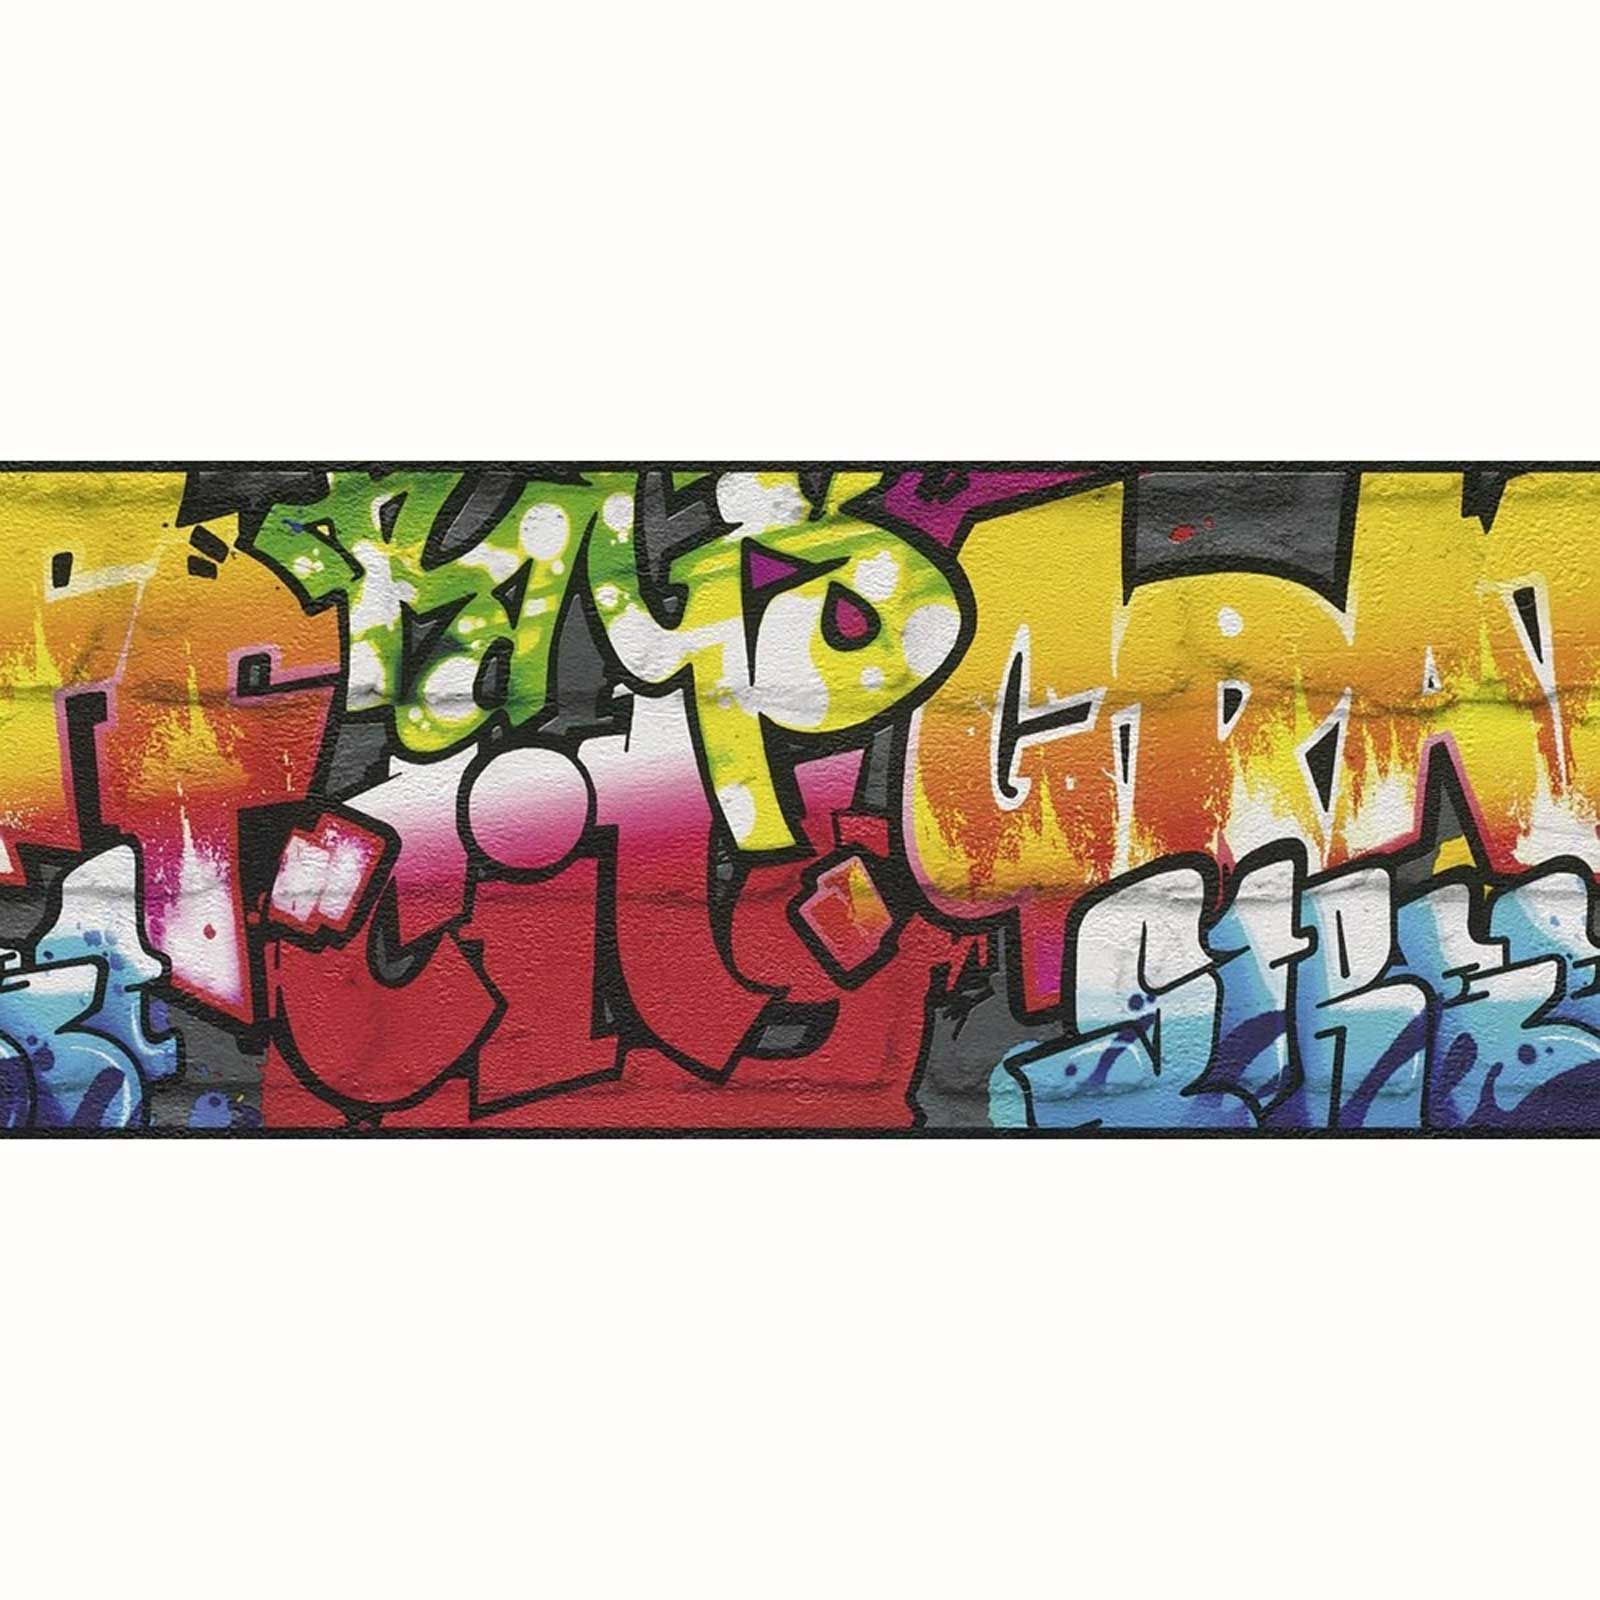 BLACK GRAFFITI WALLPAPER BORDERS   RASCH 237900   NEW ROOM DECOR 1600x1600